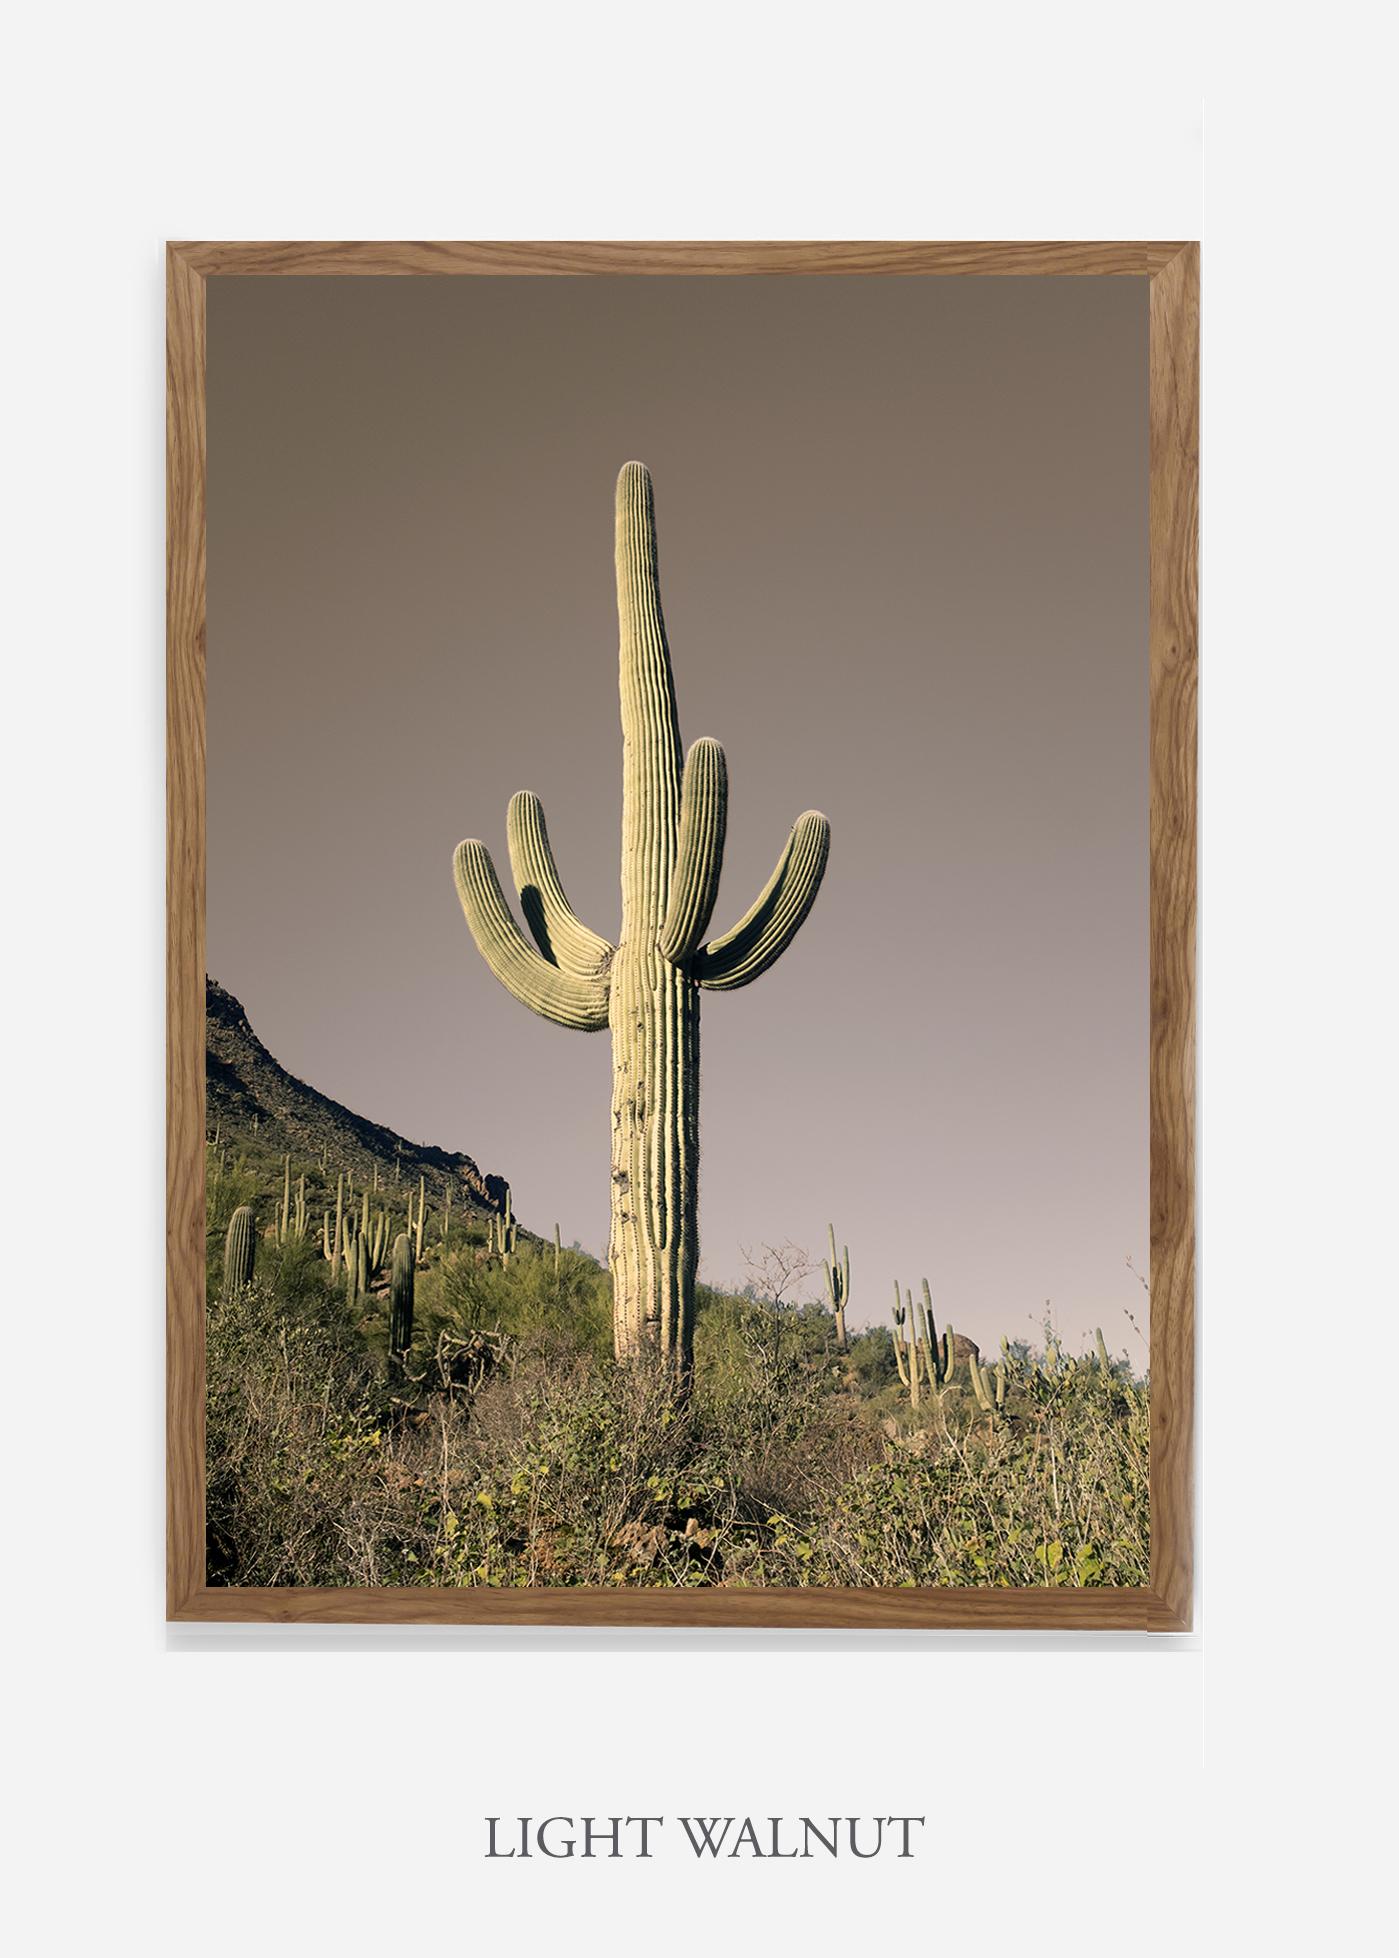 nomat-lightwalnutframe-saguaroNo.20-wildercalifornia-art-wallart-cactusprint-homedecor-prints-arizona-botanical-artwork-interiordesign.jpg